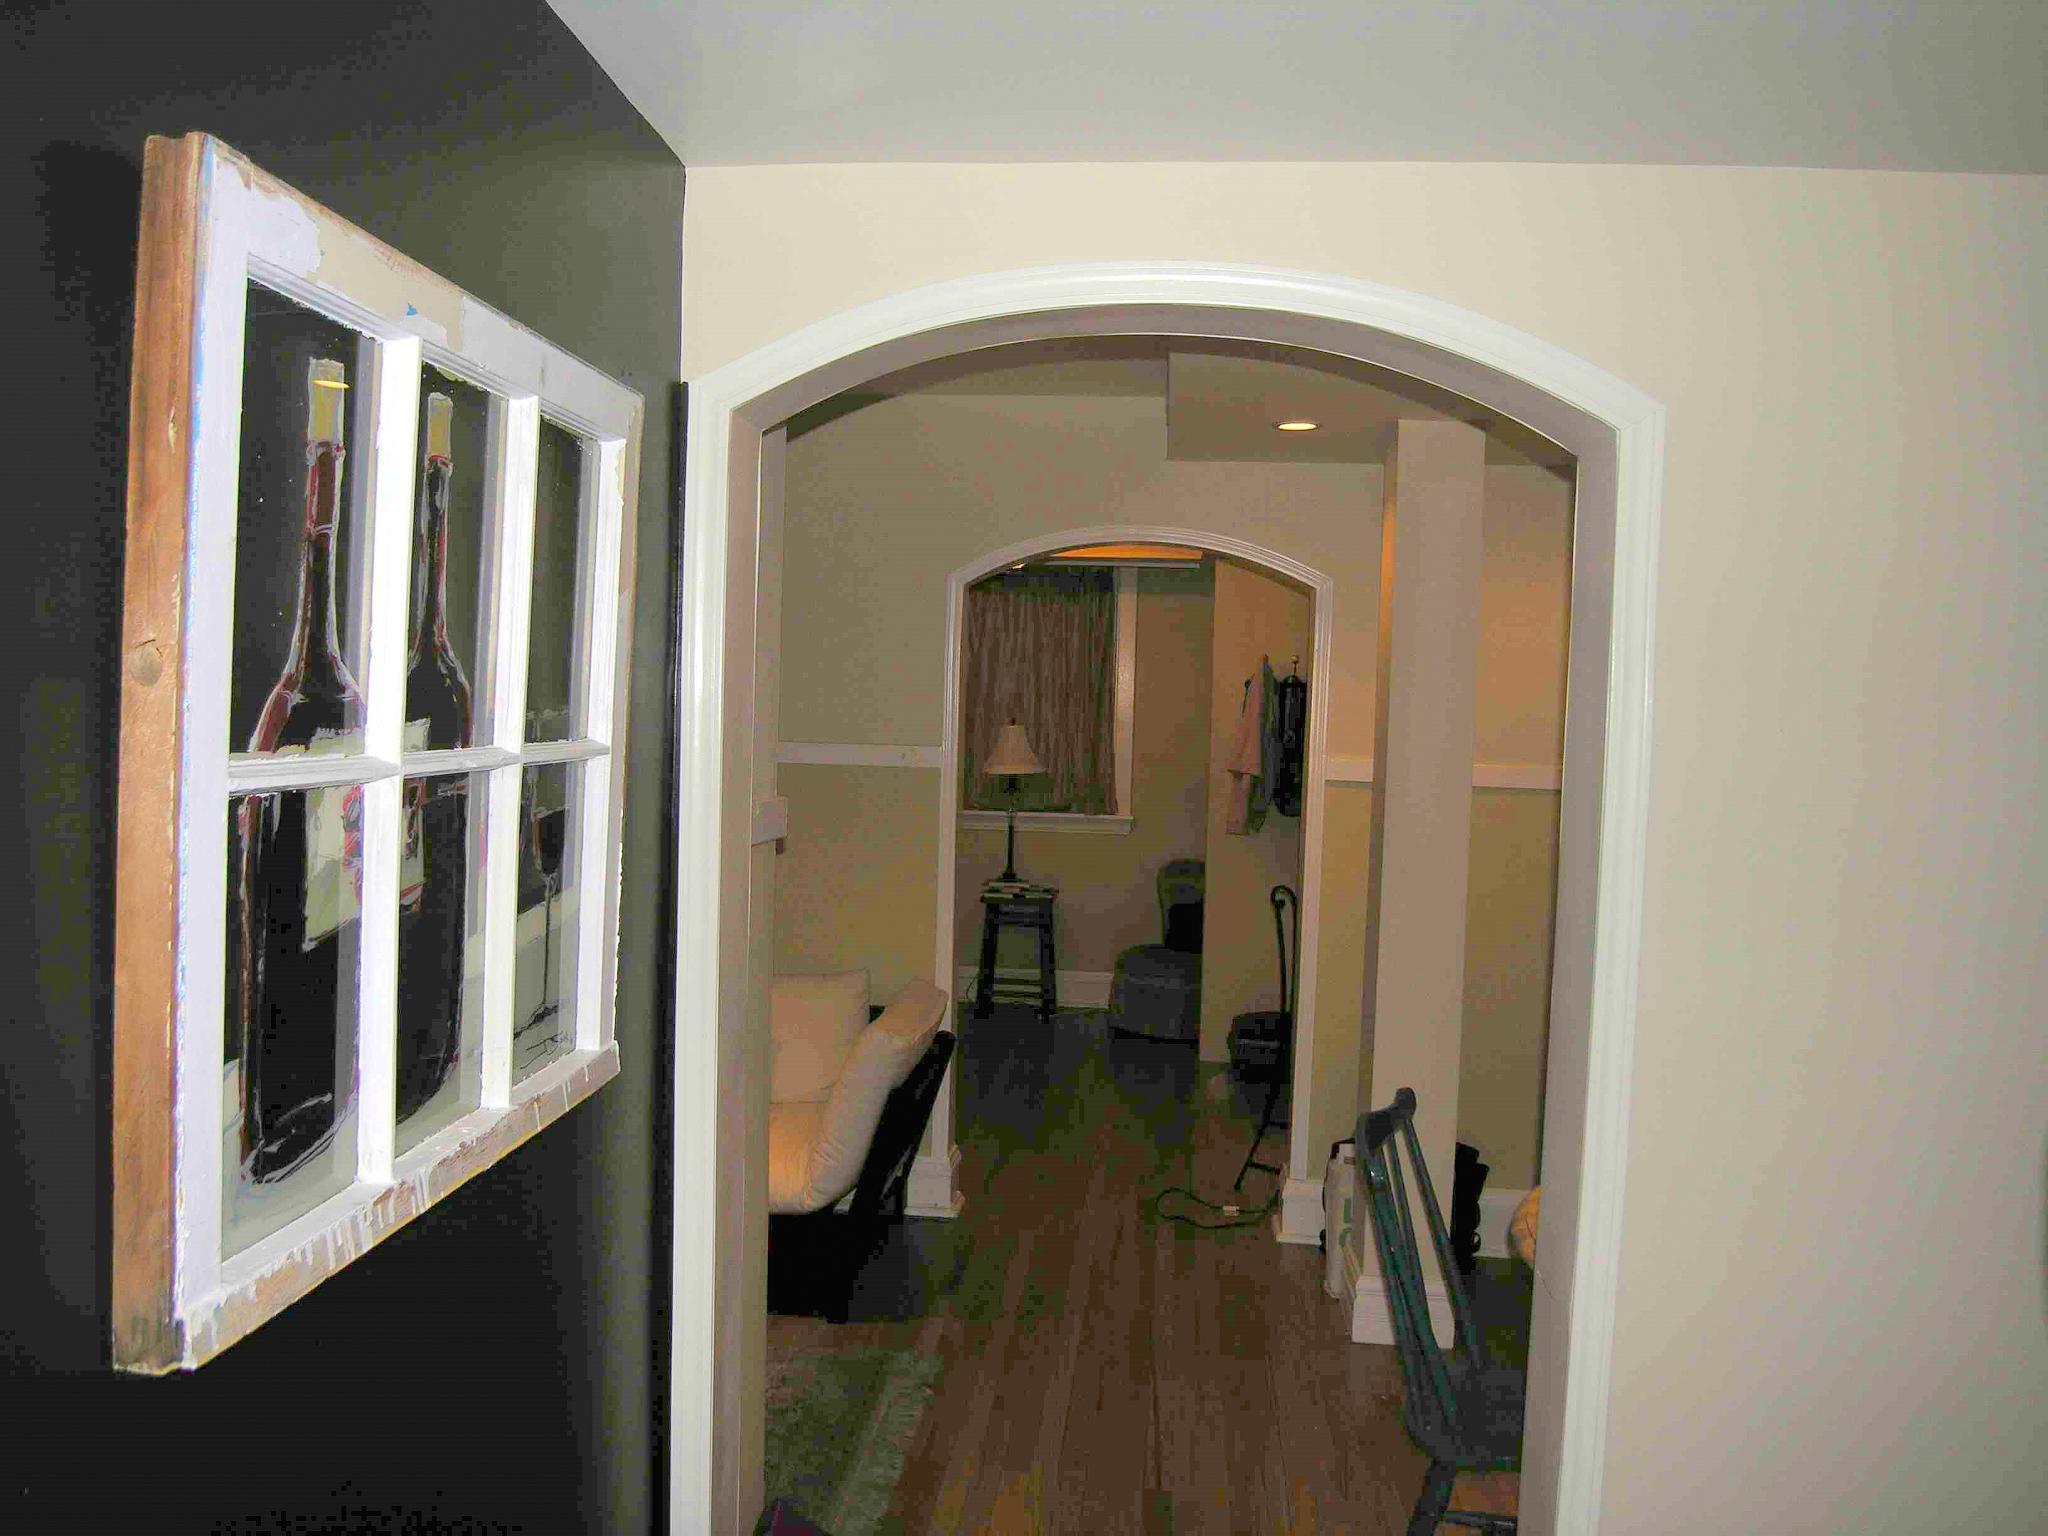 1235 W Montana St #GARDEN, Chicago, IL 60614 For Rent | Trulia